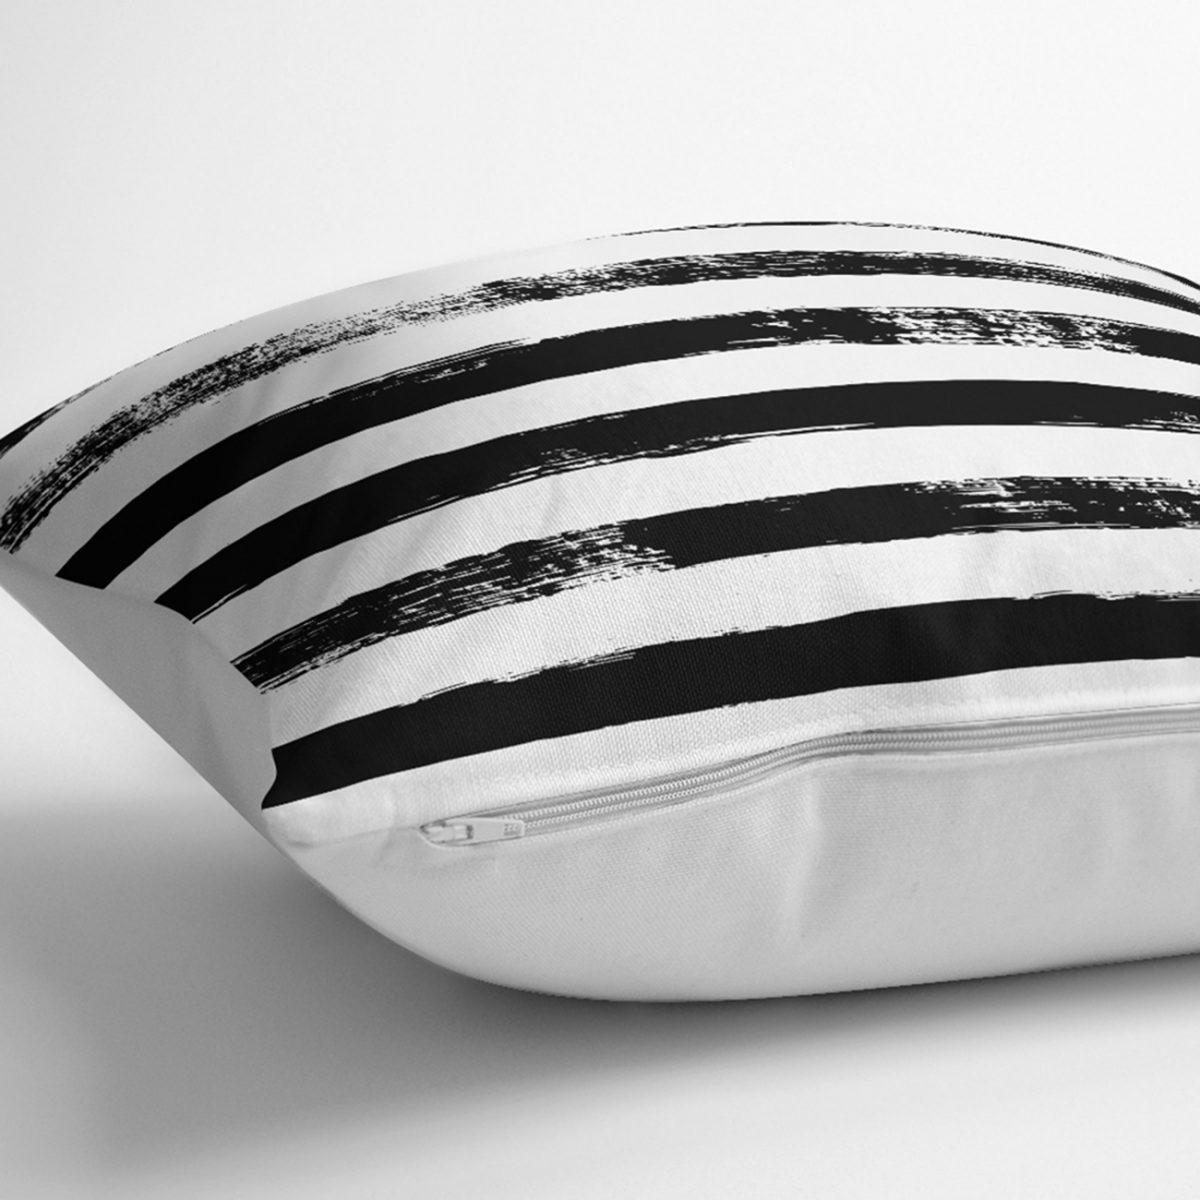 Siyah Çizgili Motifli Dekoratif Modern Yastık Kılıfı Realhomes